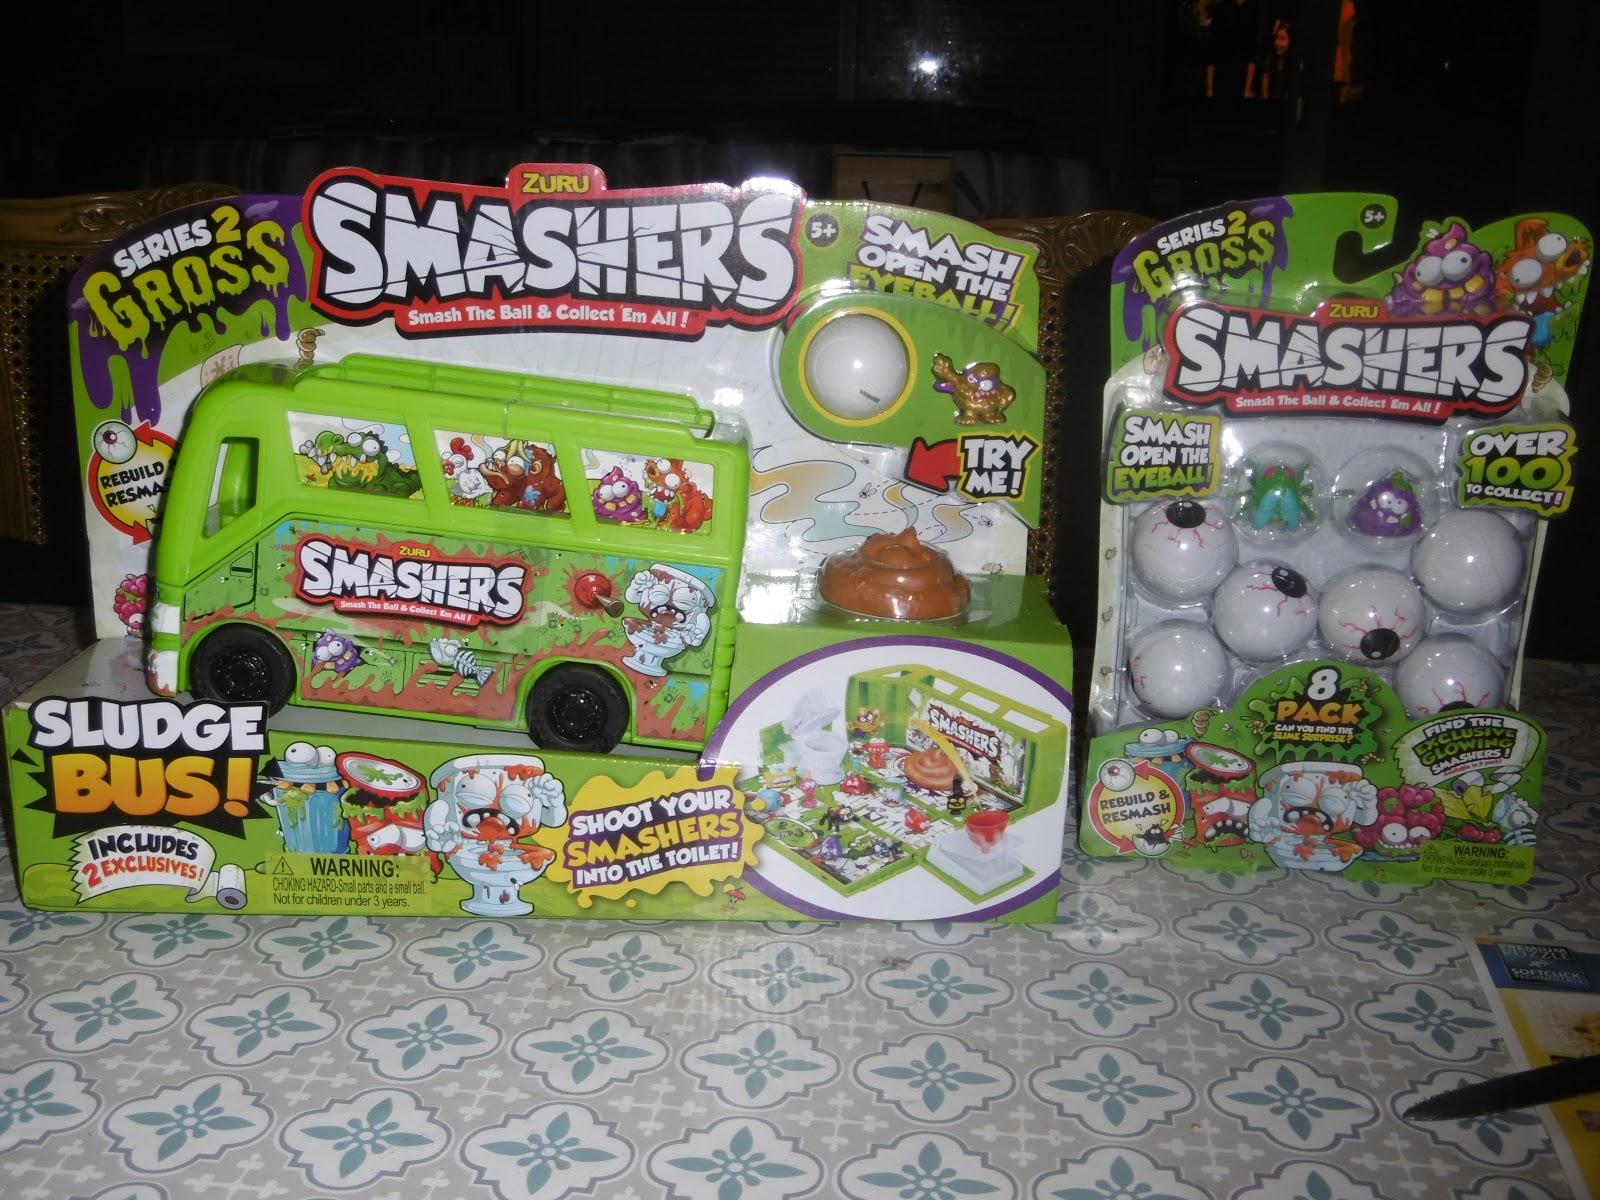 Zuru Smashers Series 2 Gross Eye Sore # 2014